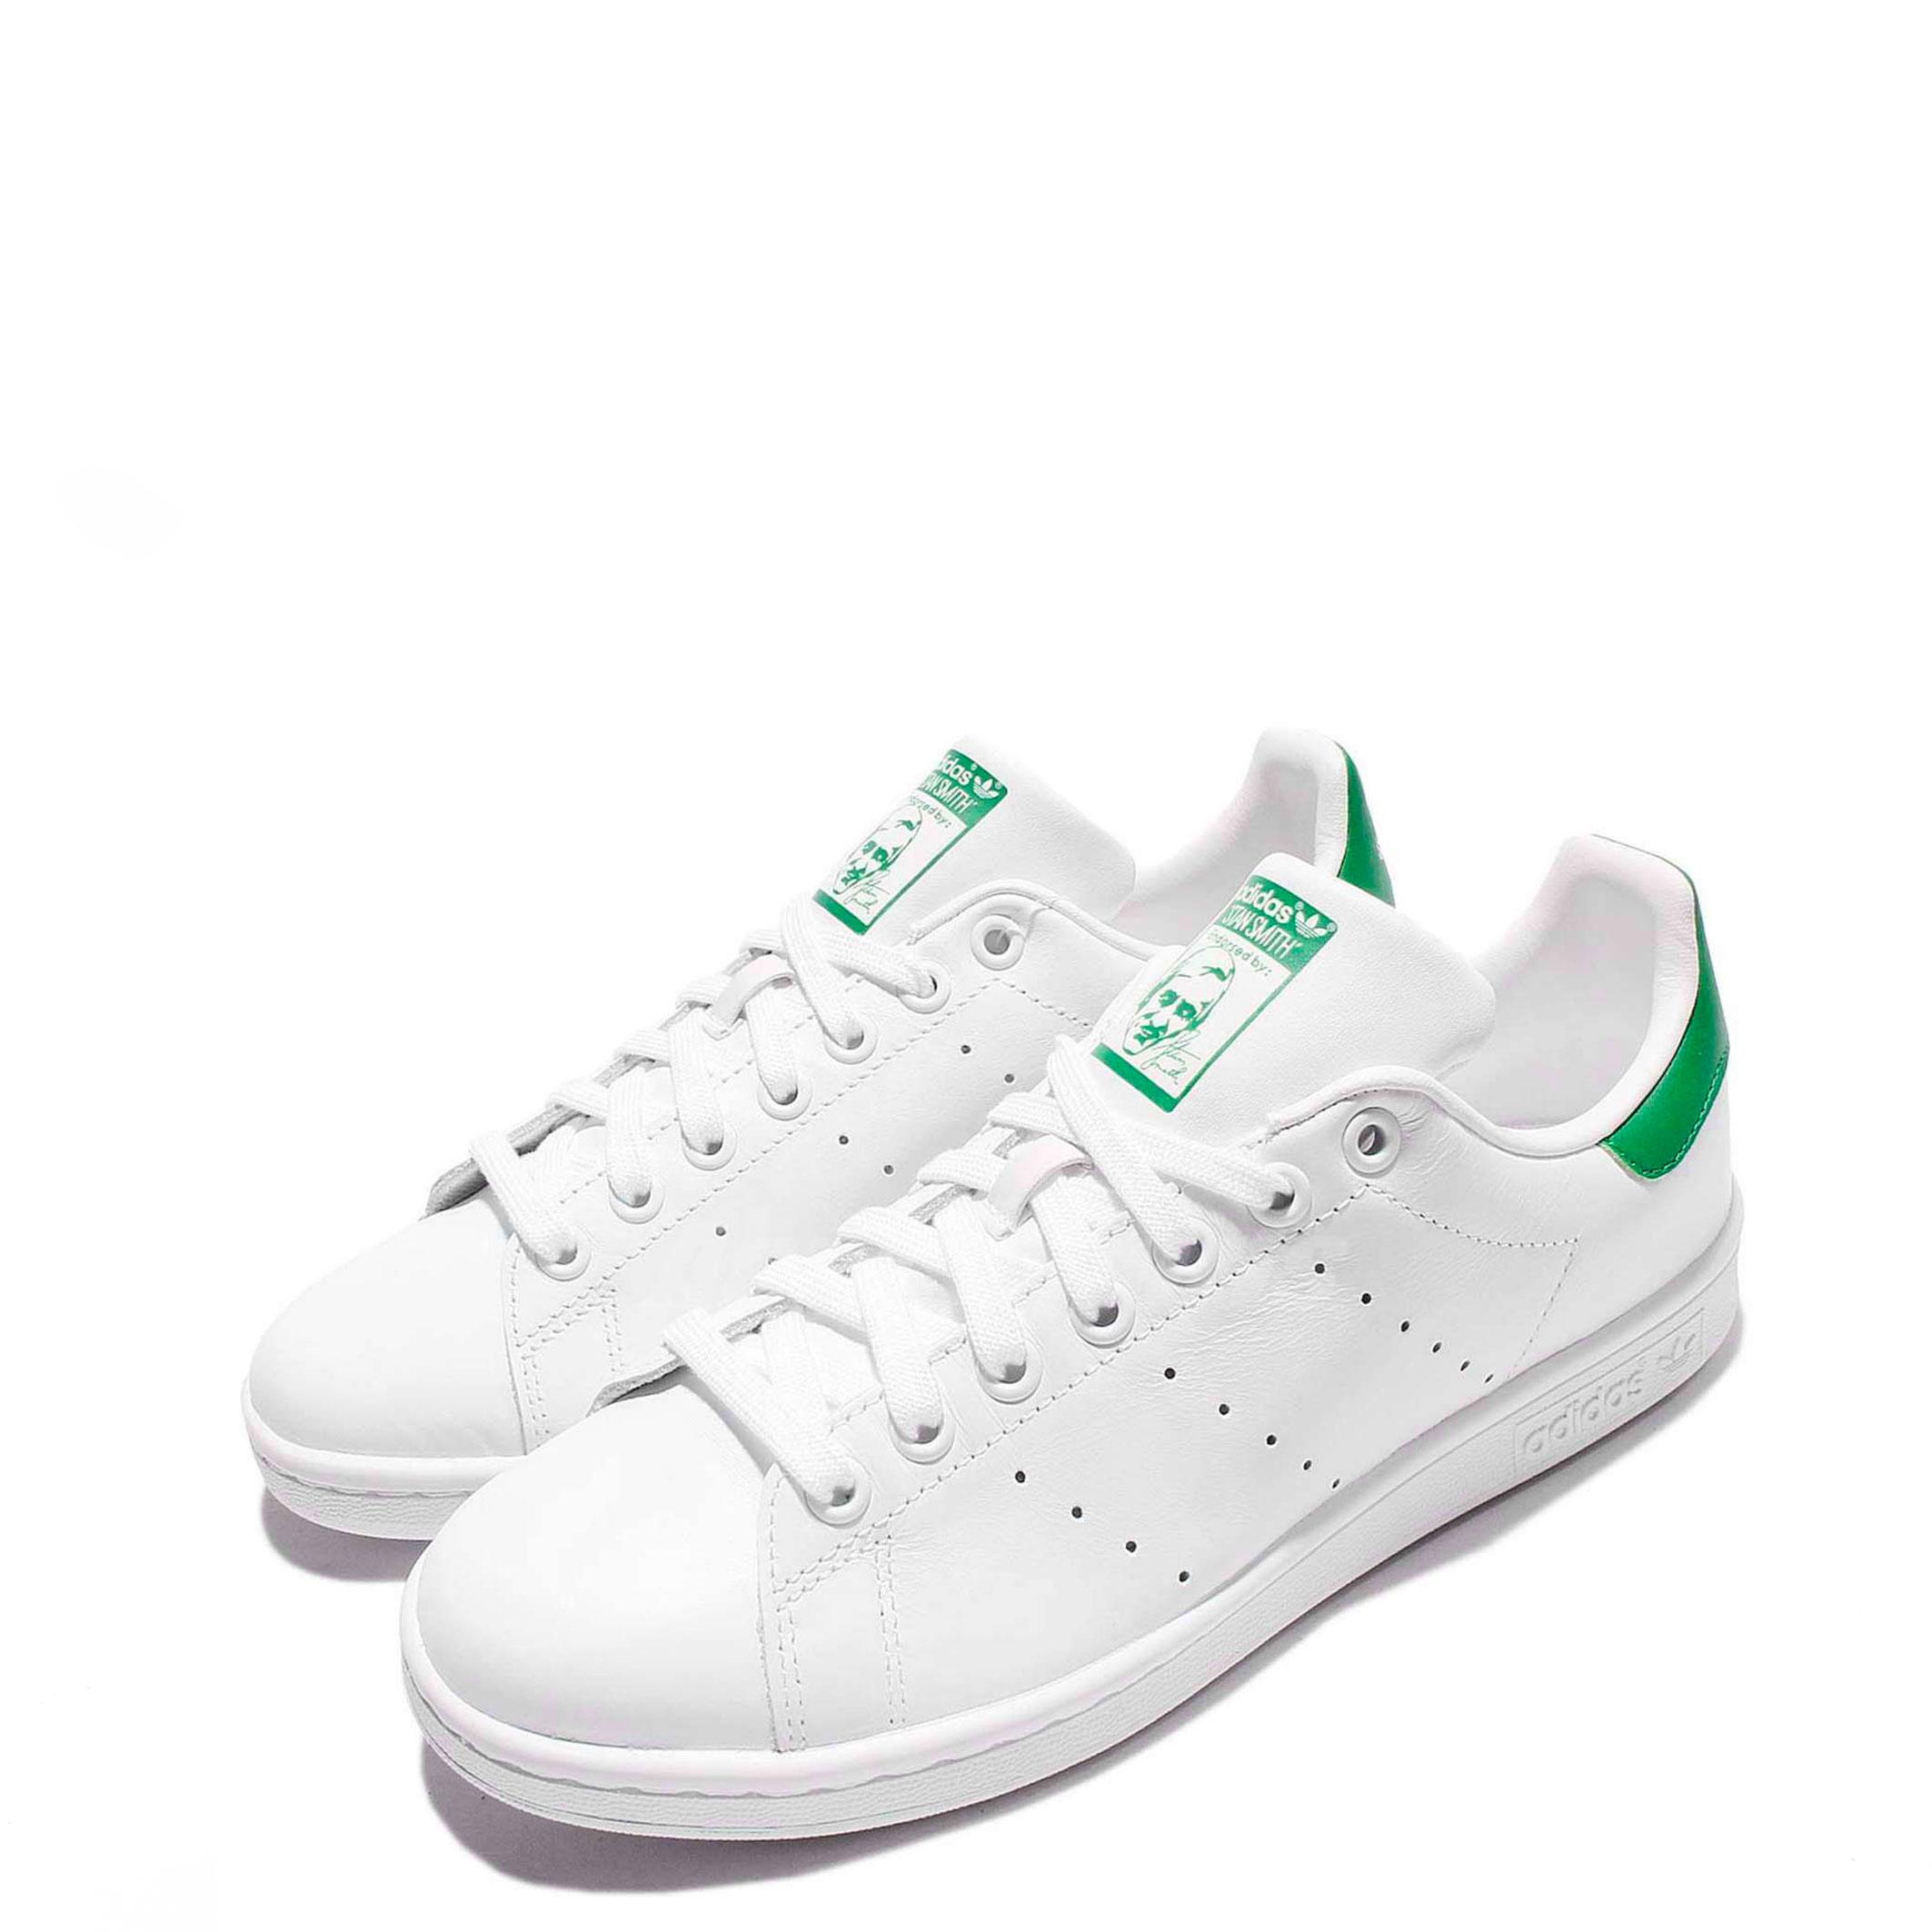 adidas stan smith uk size 4